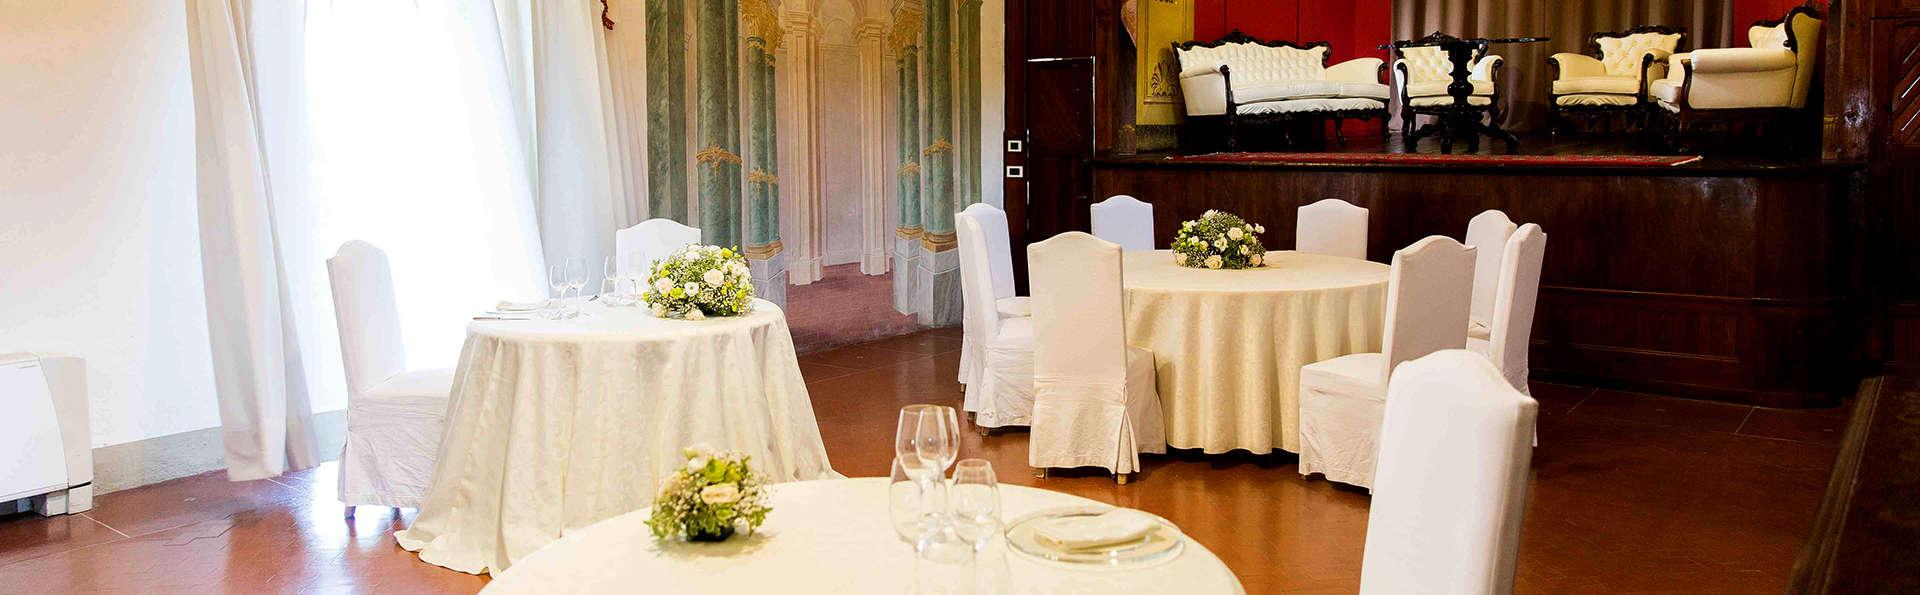 Monastero di Cherasco - Hotel i Somaschi - Edit_Restaurant.jpg